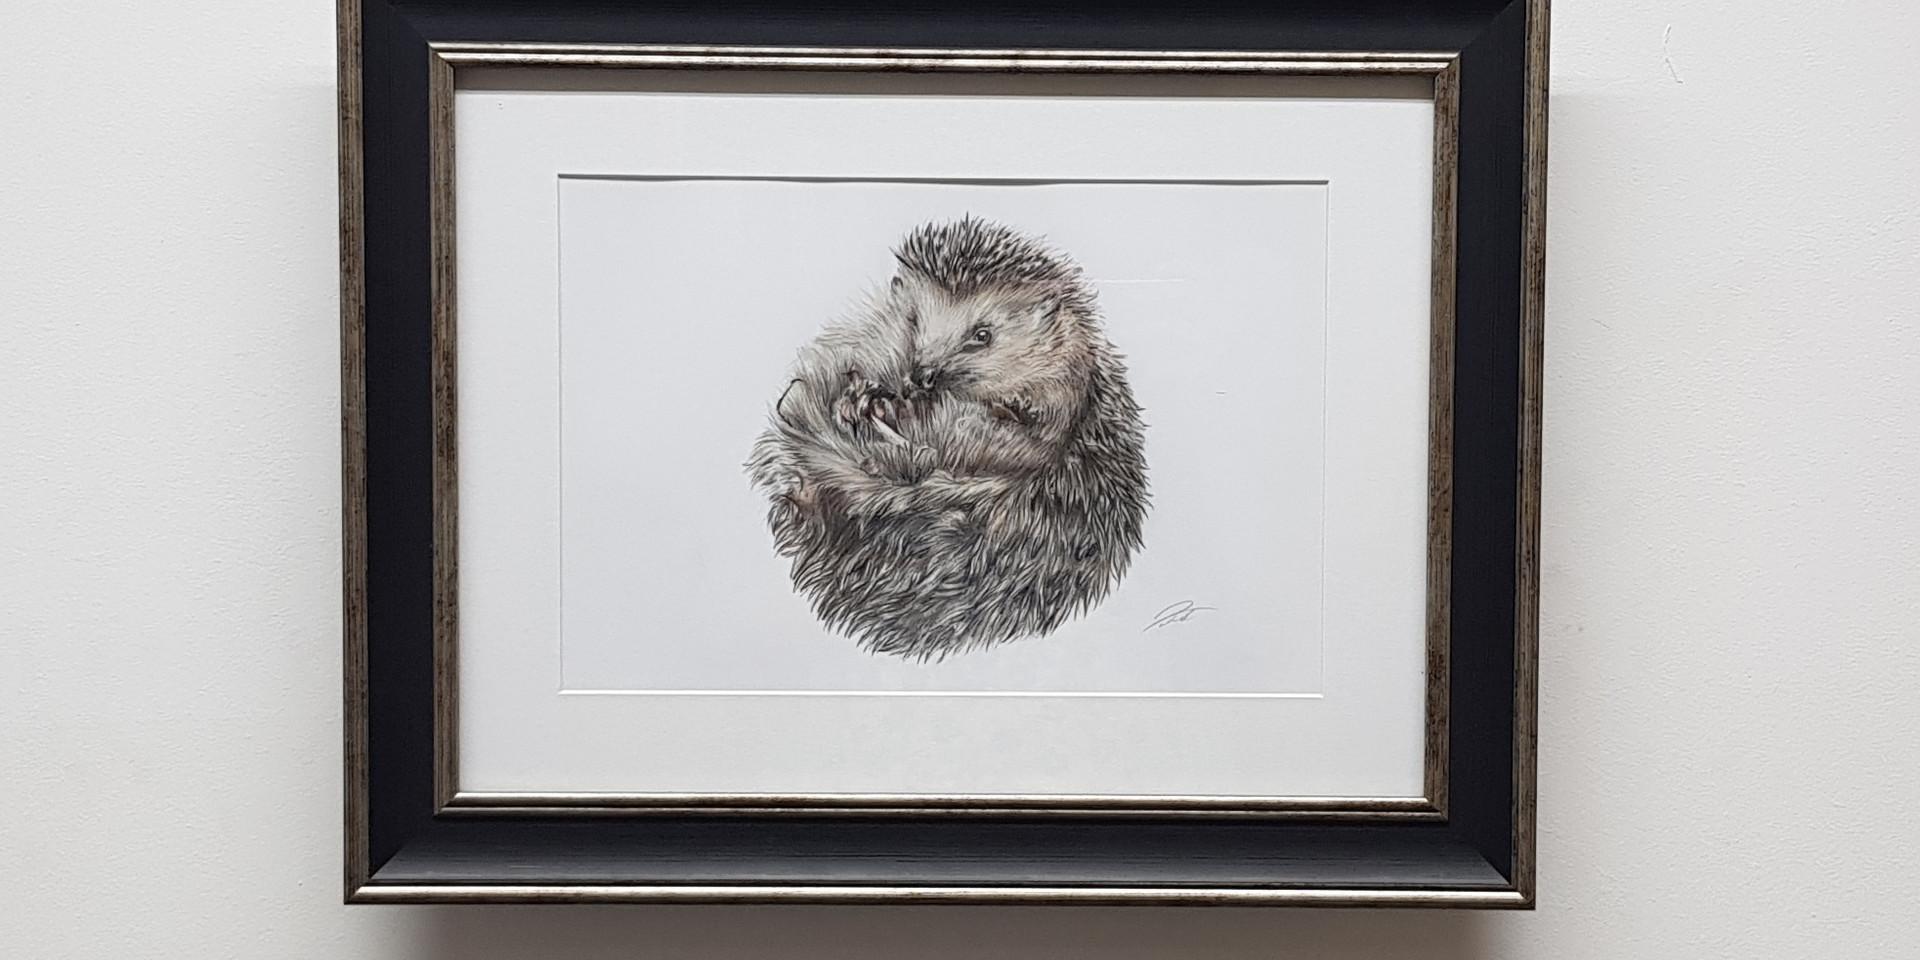 Spike The Hedgehog by Rachel Baker Artist